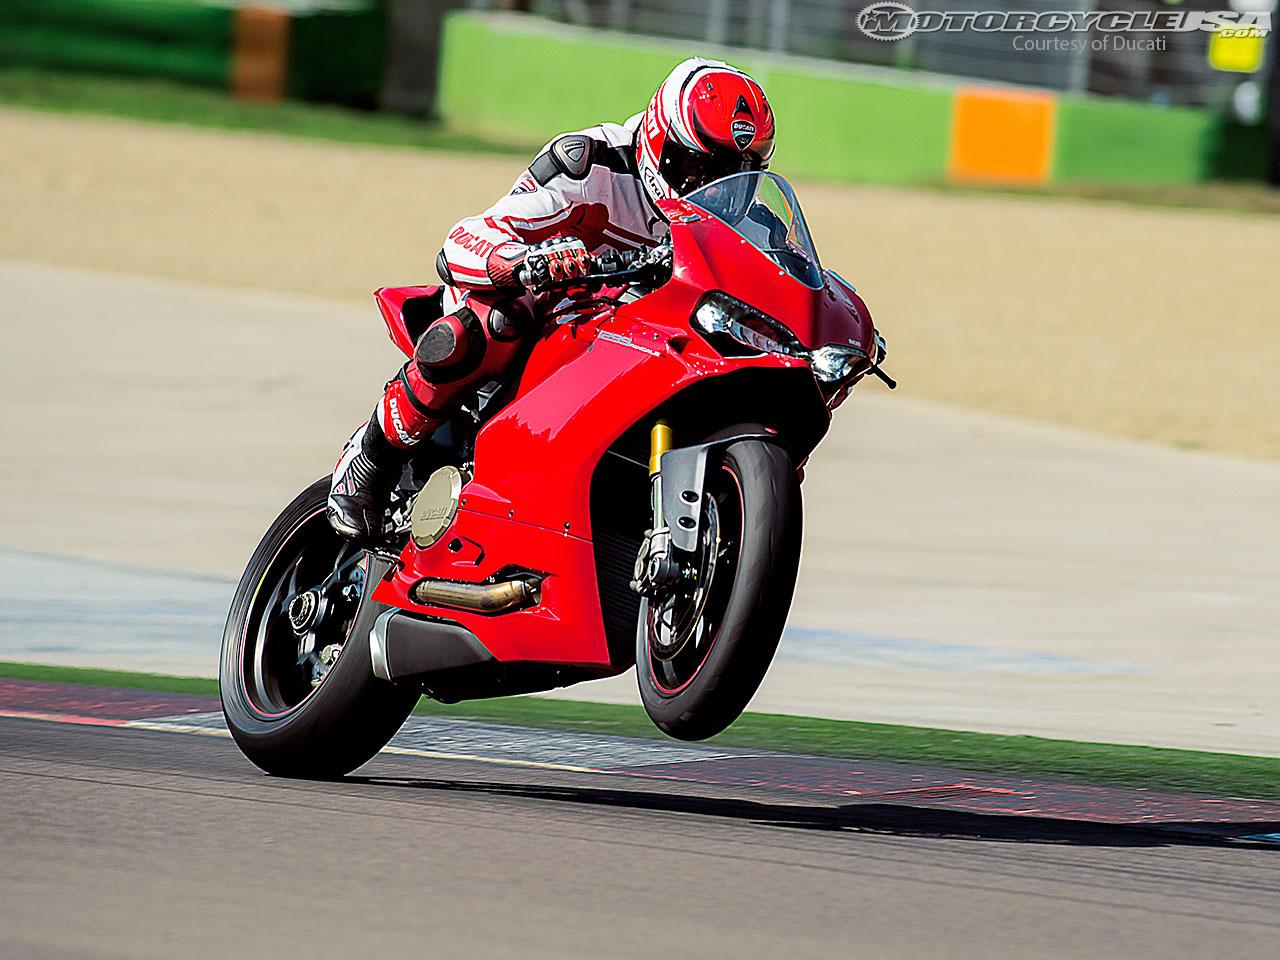 2015 Ducati 1299 Panigale Wallpaper 1280x960